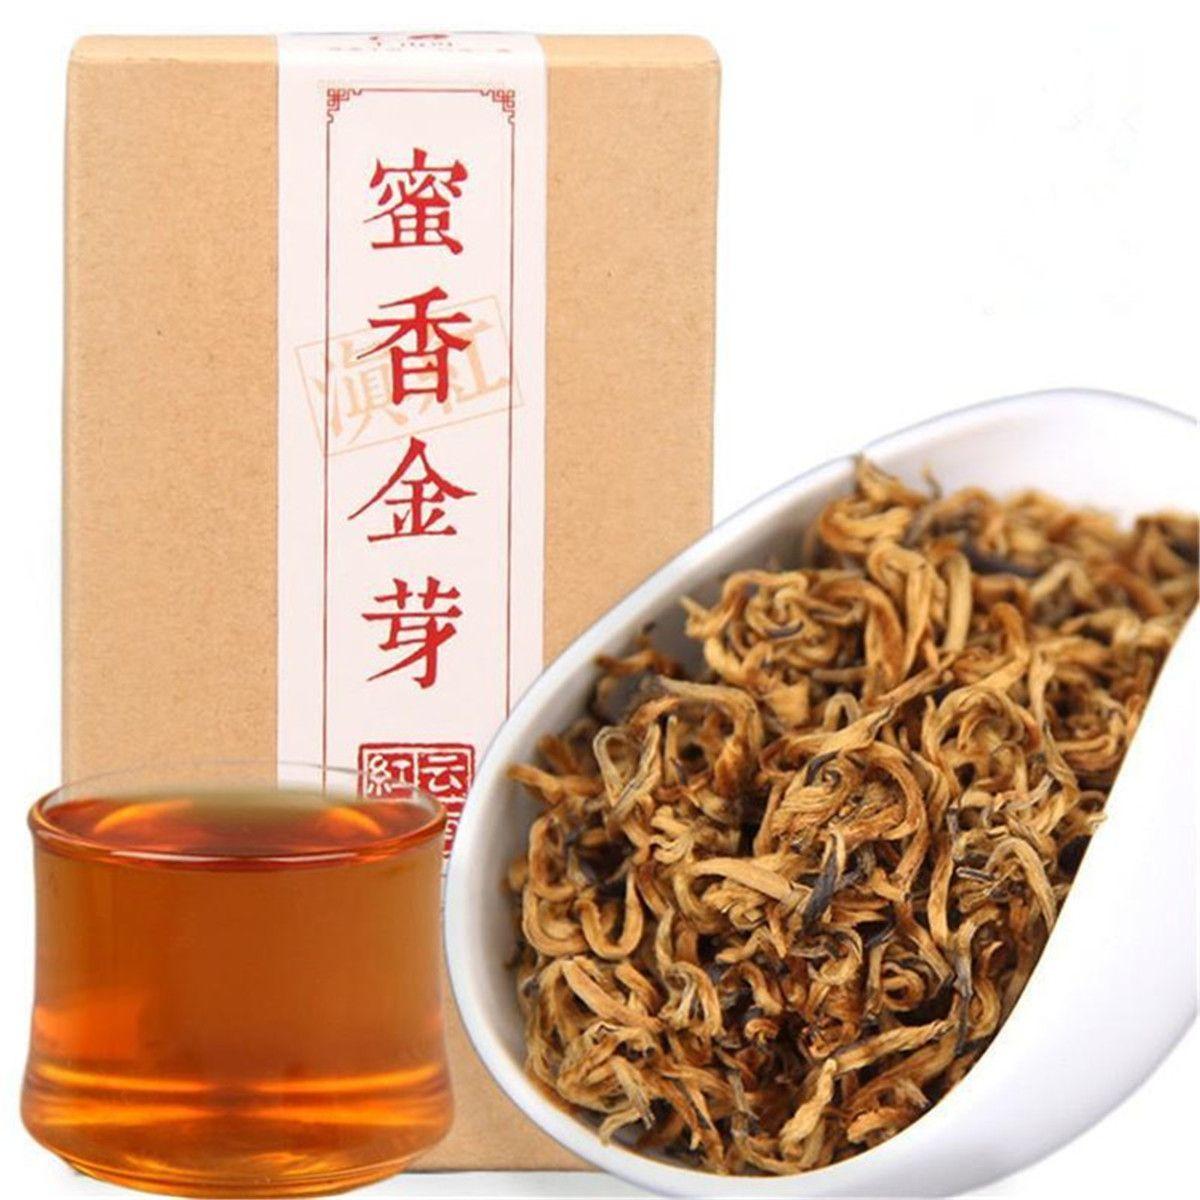 Yunnan chá preto 100g Fengqing Dianhong Chinese Kung Fu início chá vermelho Primavera mel fragrância Buds ouro grandes folhas de chá Red